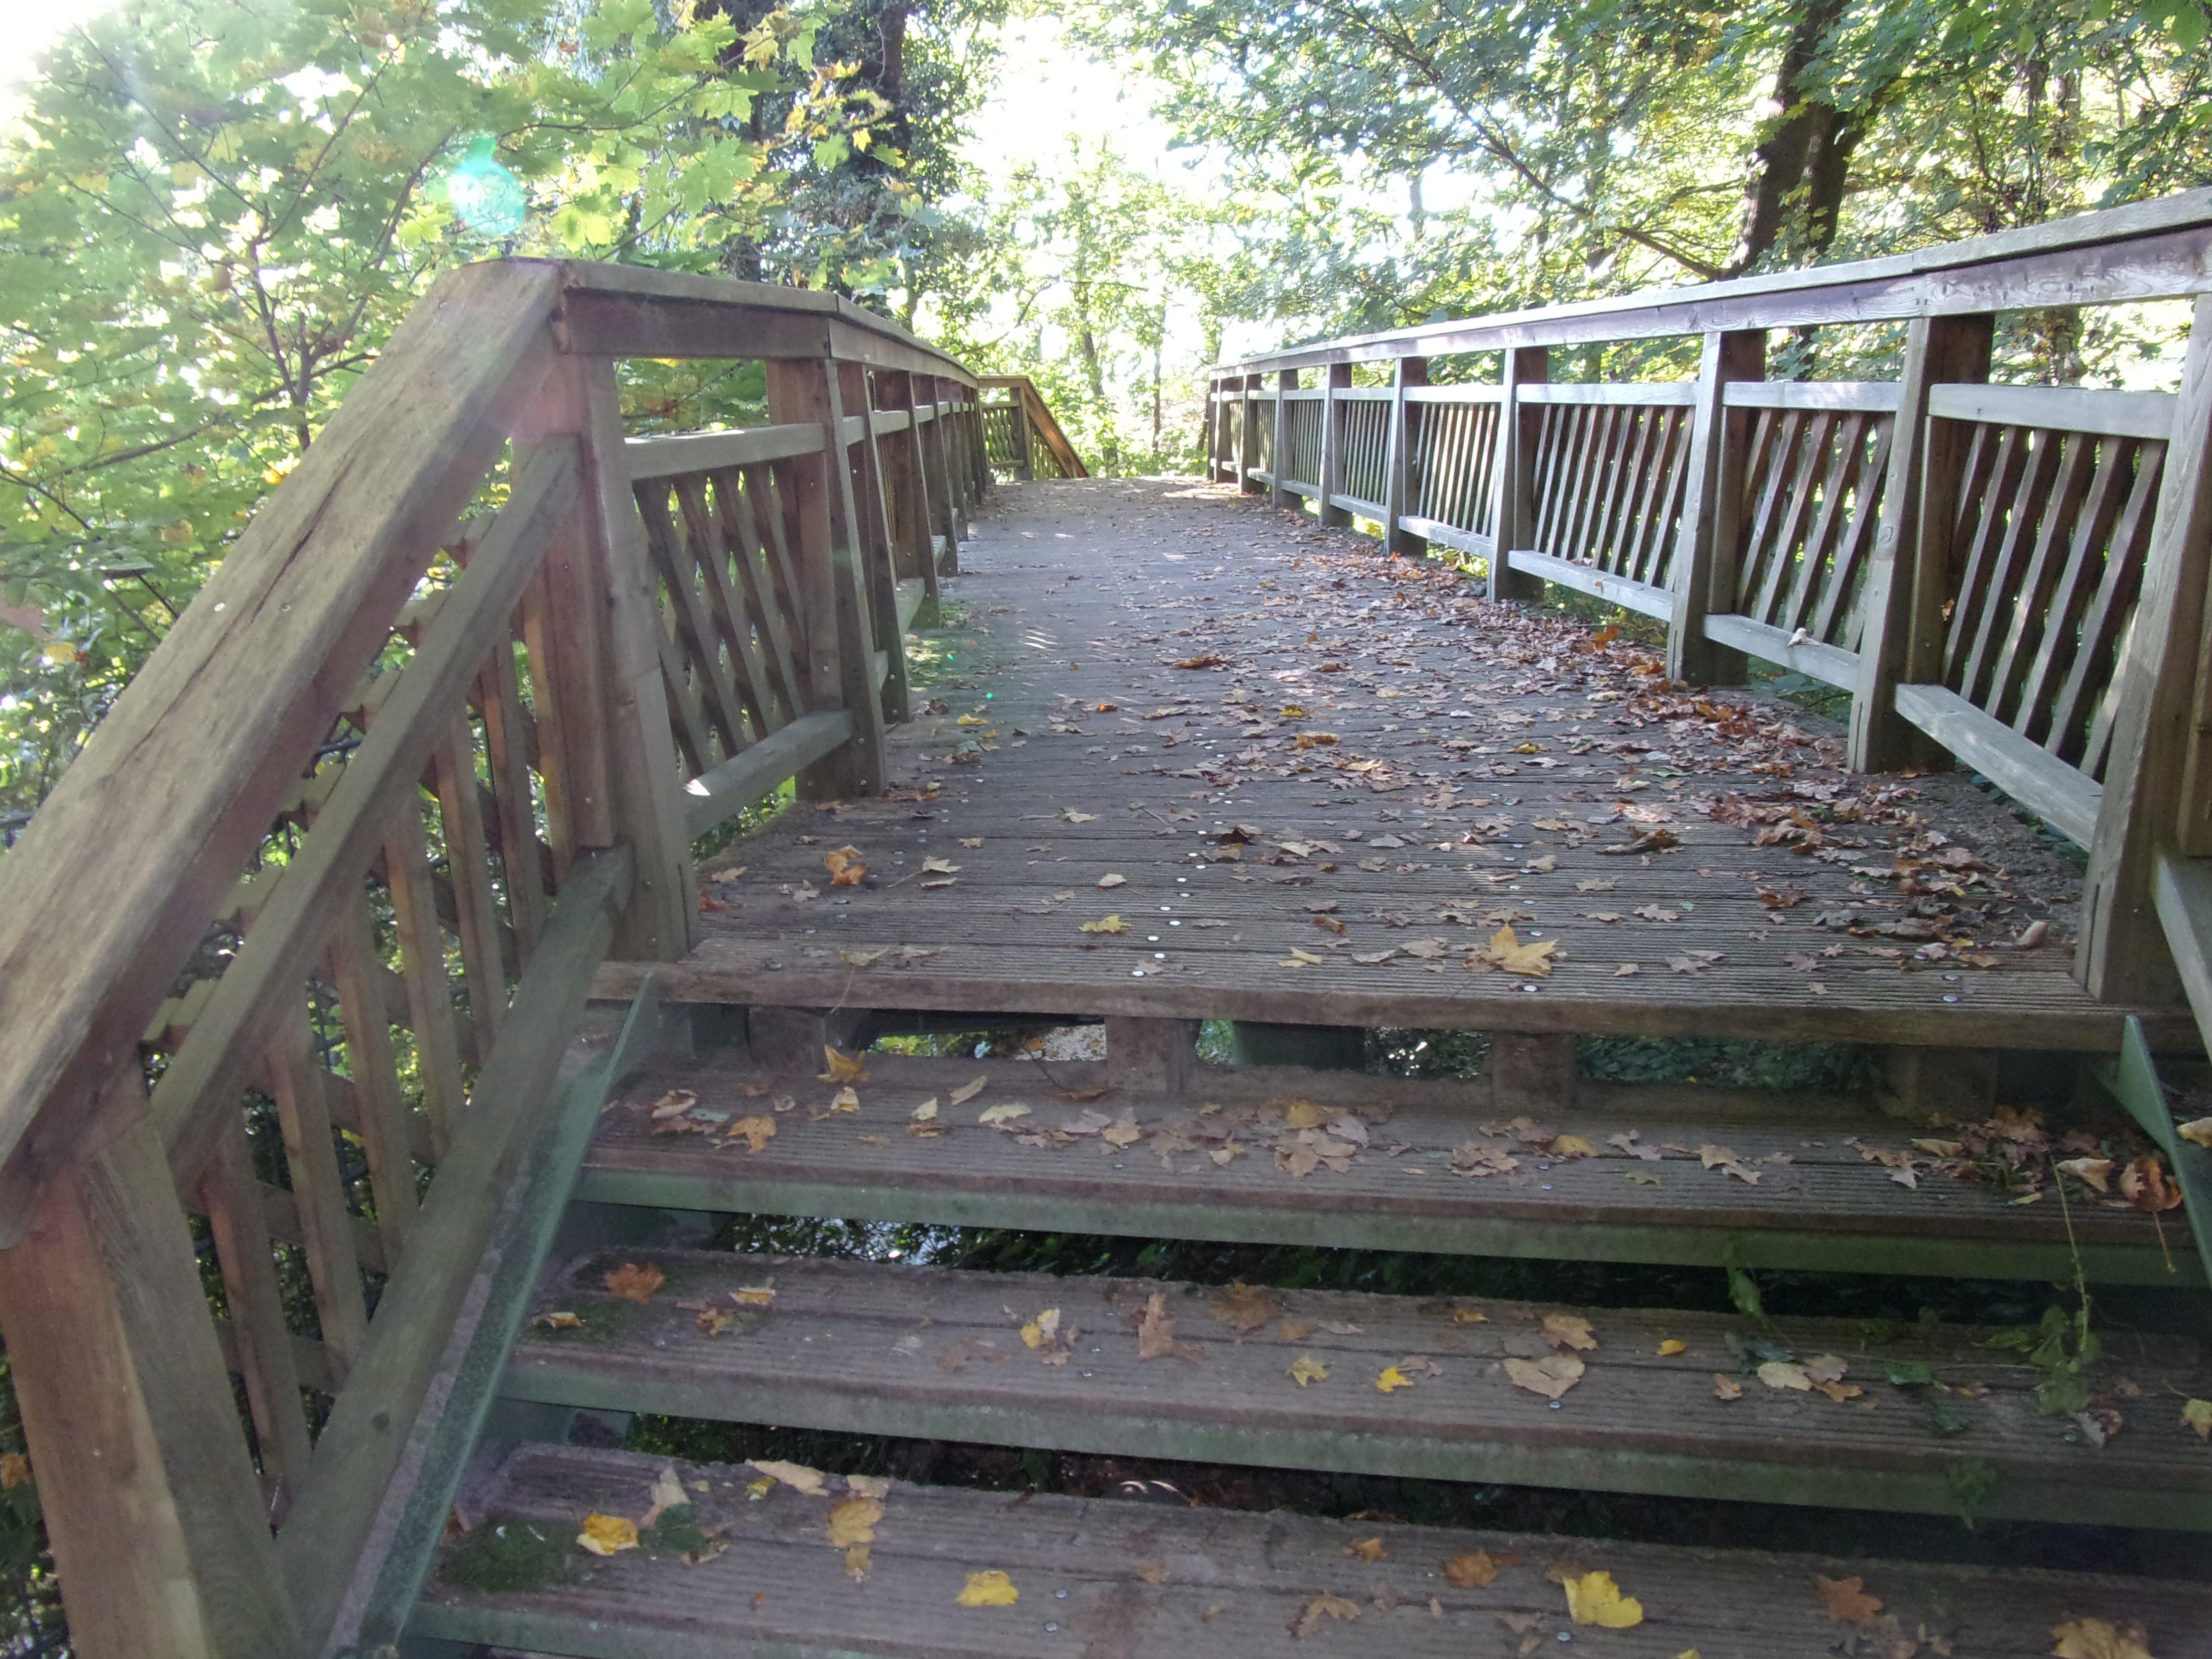 Fileholzbrücke Im Römischen Garten 2jpg Wikimedia Commons